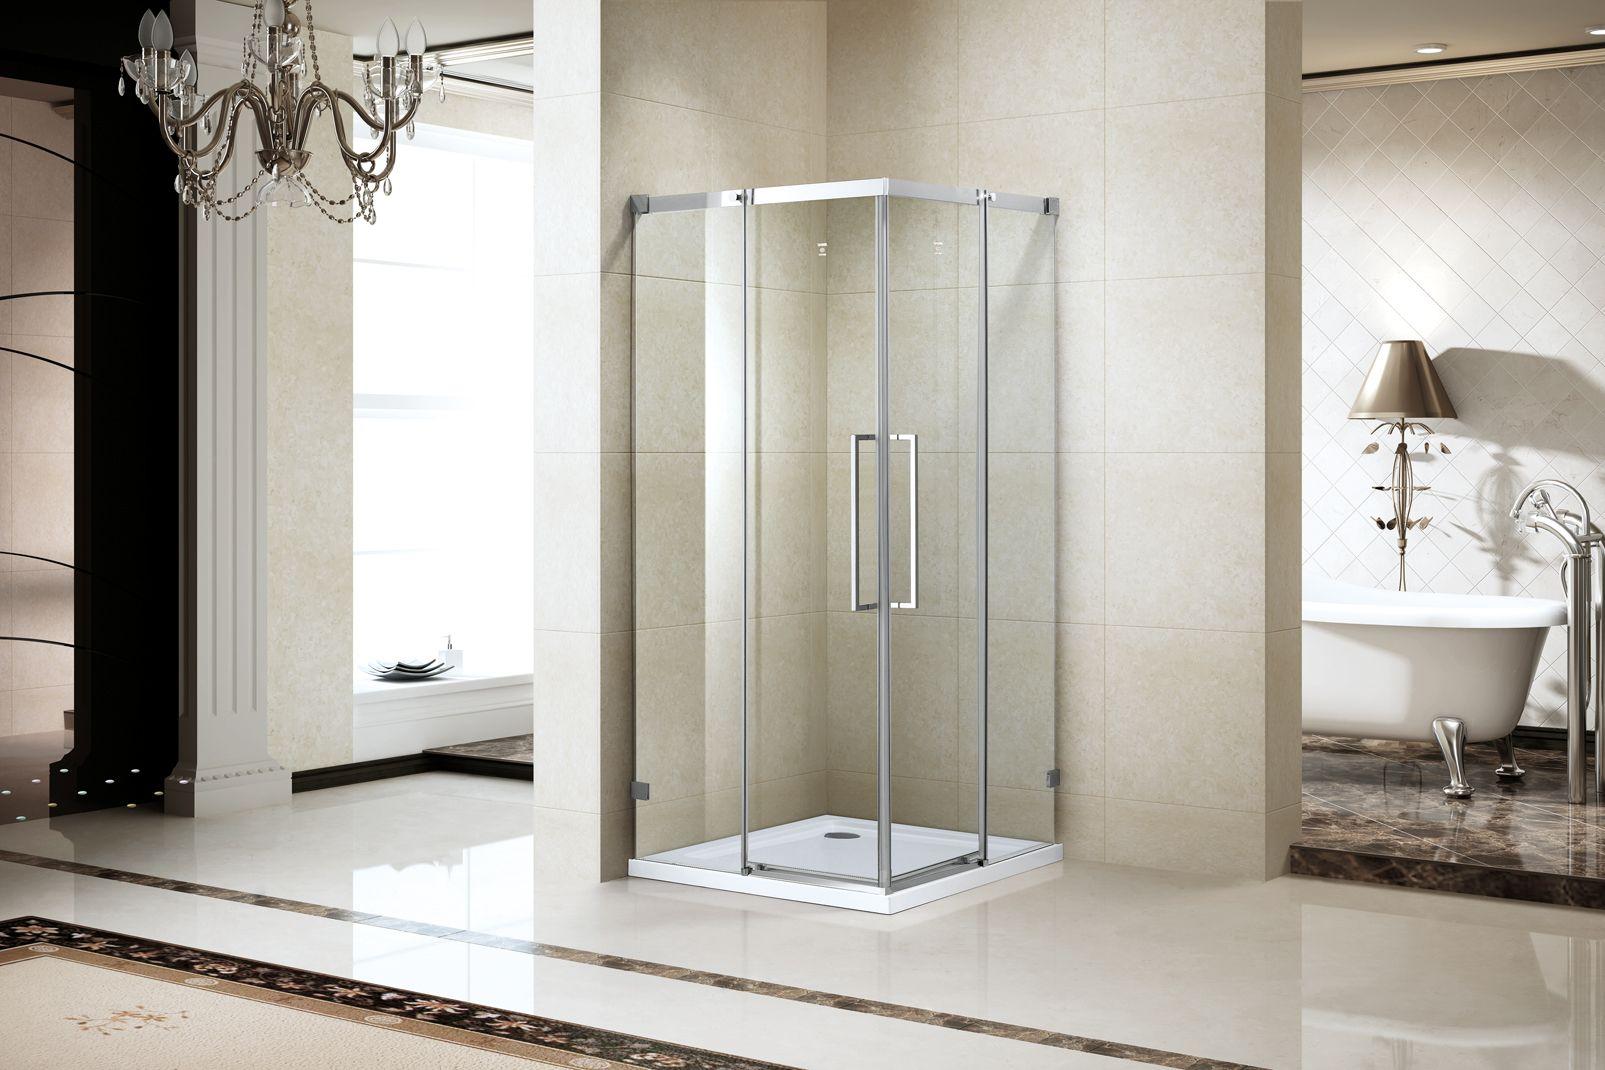 We Offer Reasonable Beautiful And Comprehensive Shower Doors Shower Cubicles Shower Rooms Corn Corner Shower Enclosures Shower Enclosure Glass Shower Doors